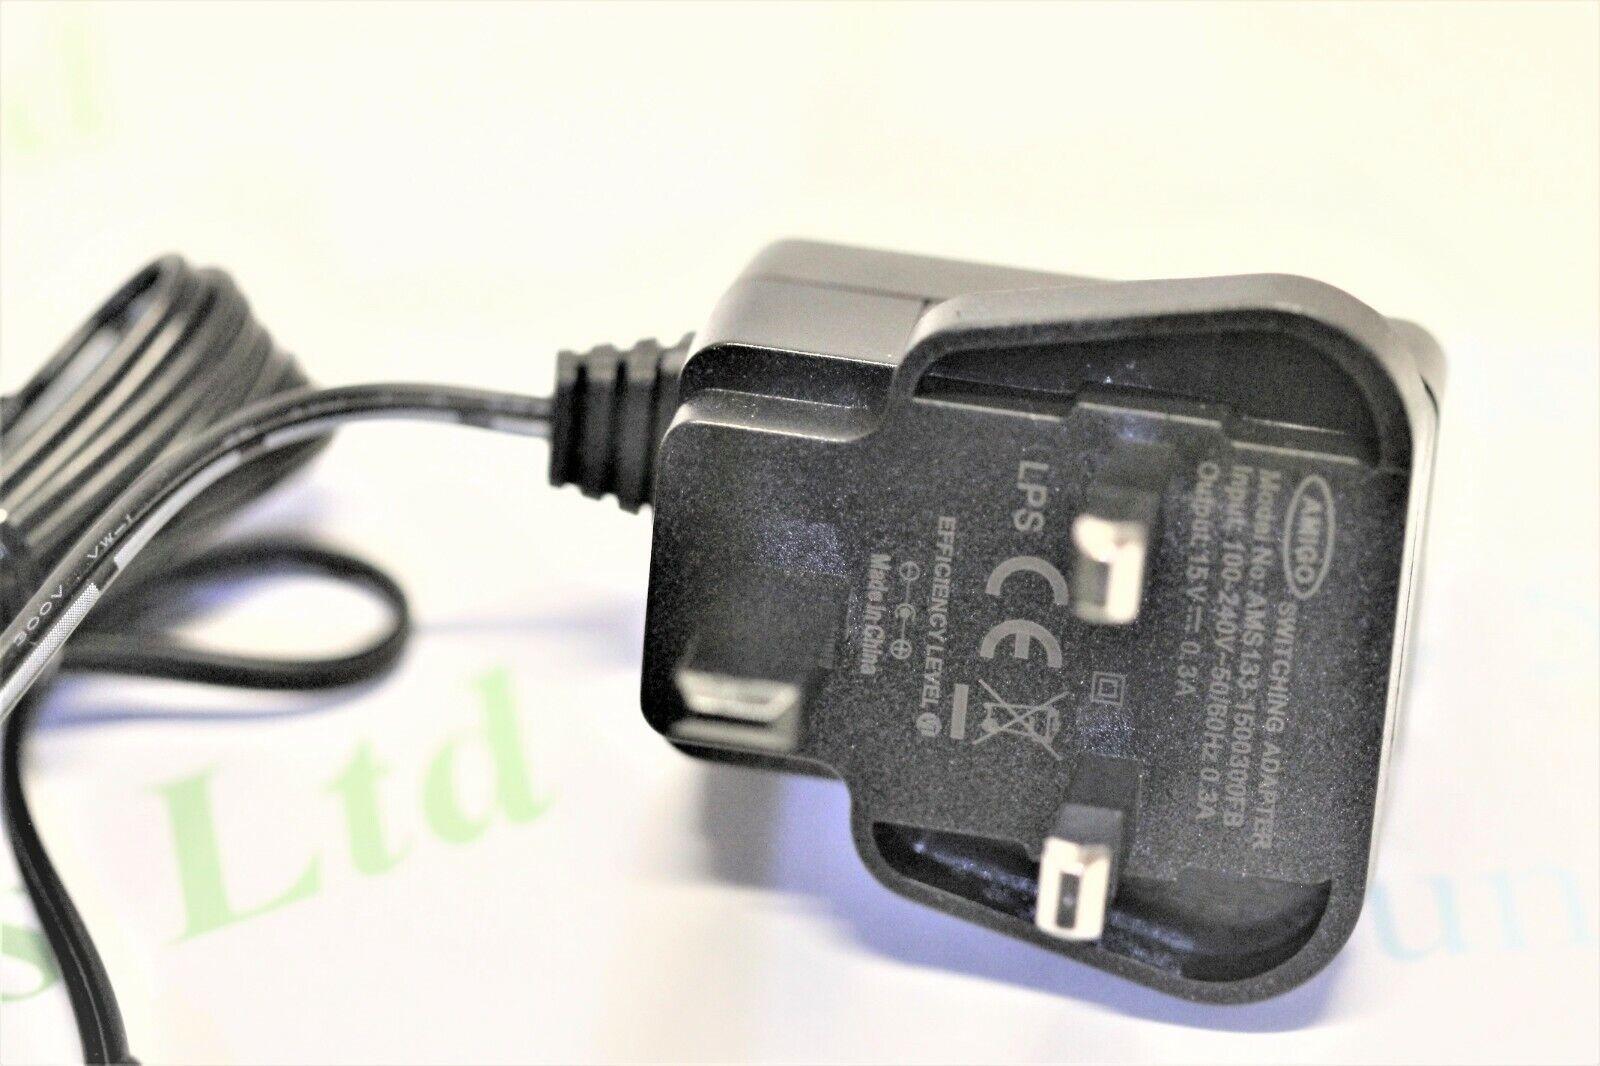 1000700060-00 TOA radio microphone receiver power supply 15v dc 300mA